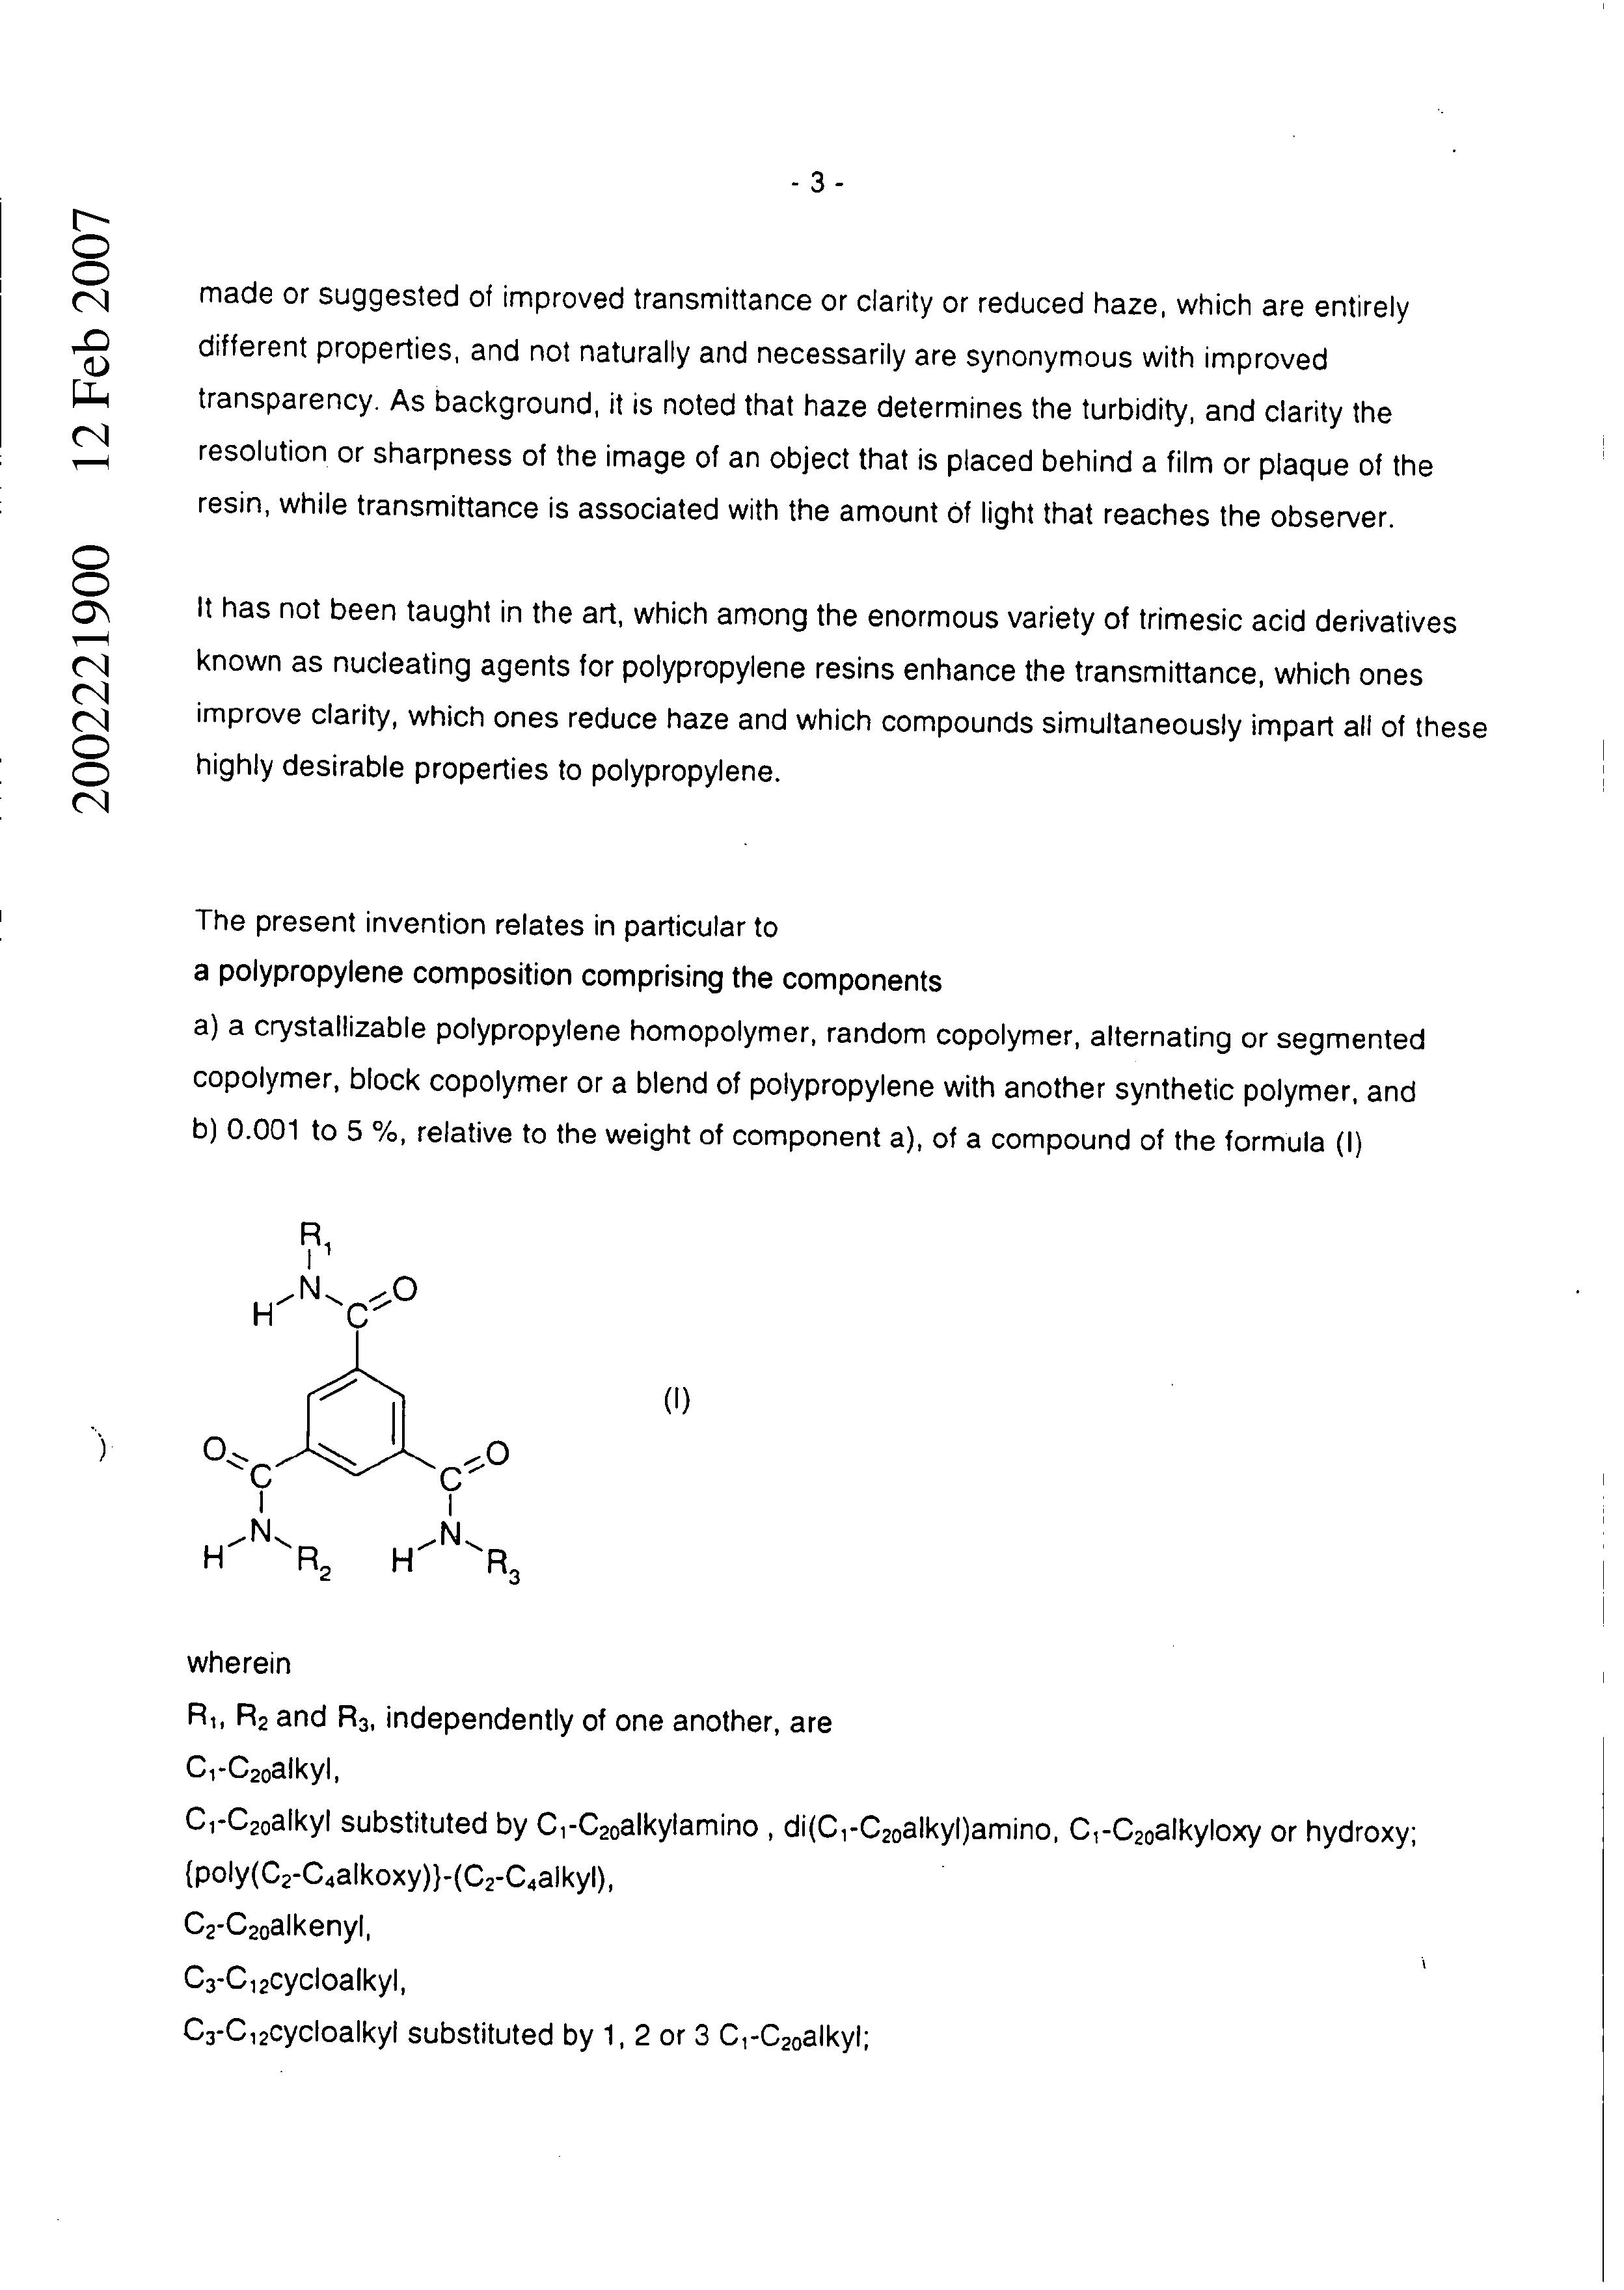 AU 2002/221900 B2 - Polypropylene Resin Compositions - The